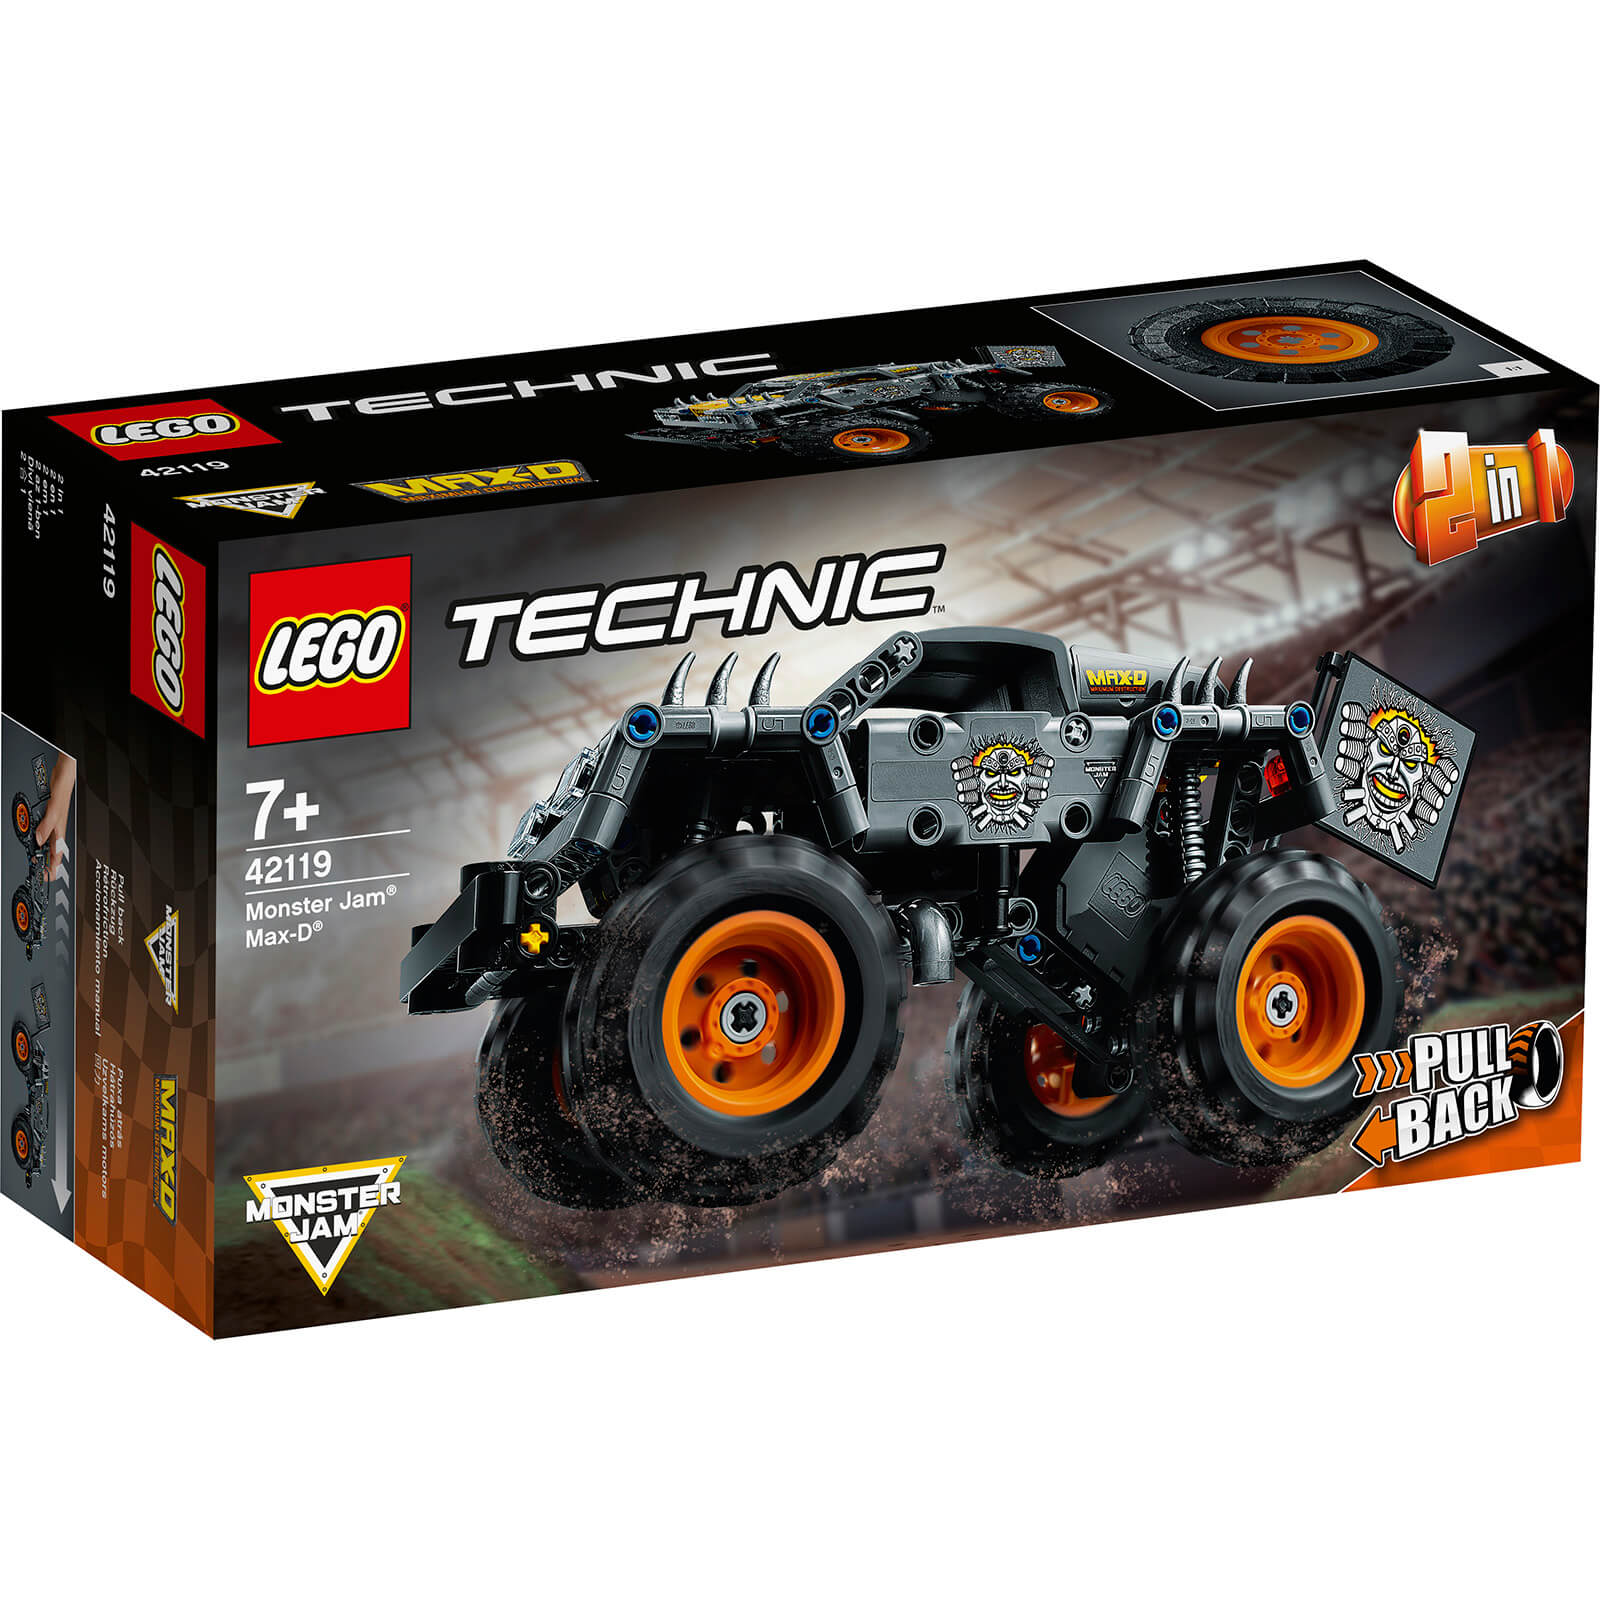 Image of LEGO Technic Monster Jam Max-D - 42119